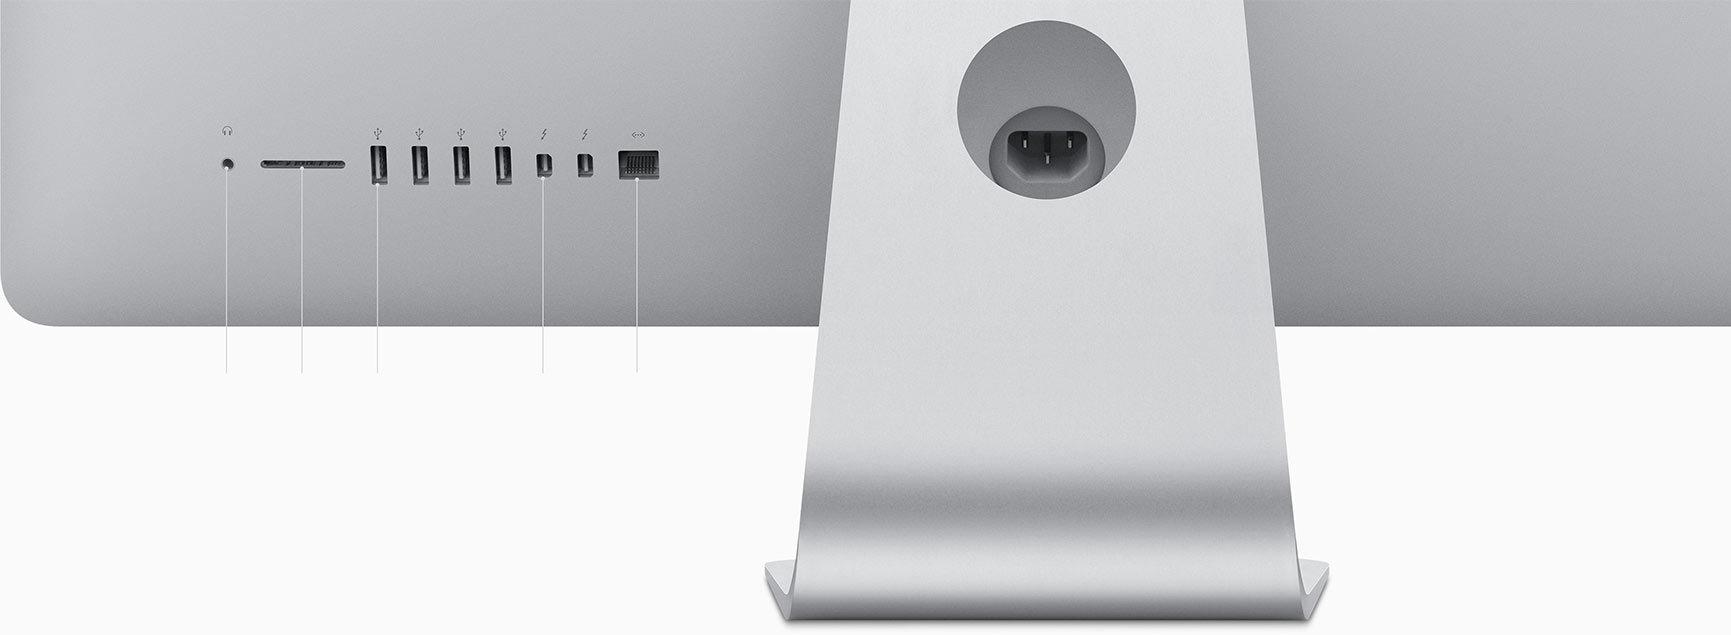 Apple iMac (2015)